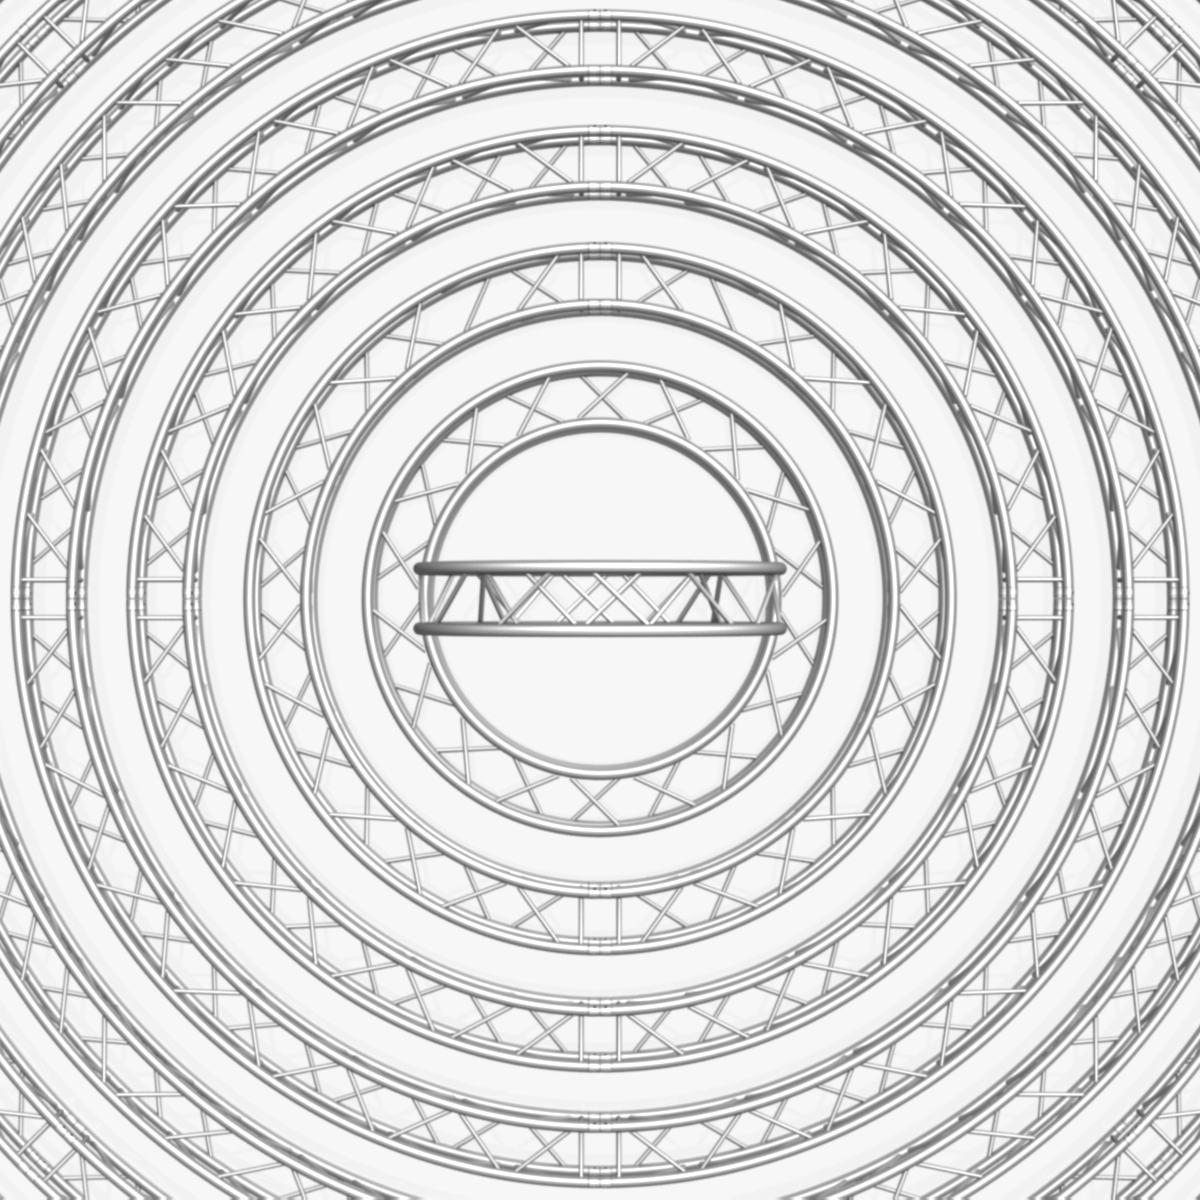 circle square truss modular collection 3d model 3ds max dxf fbx c4d dae  texture obj 252346